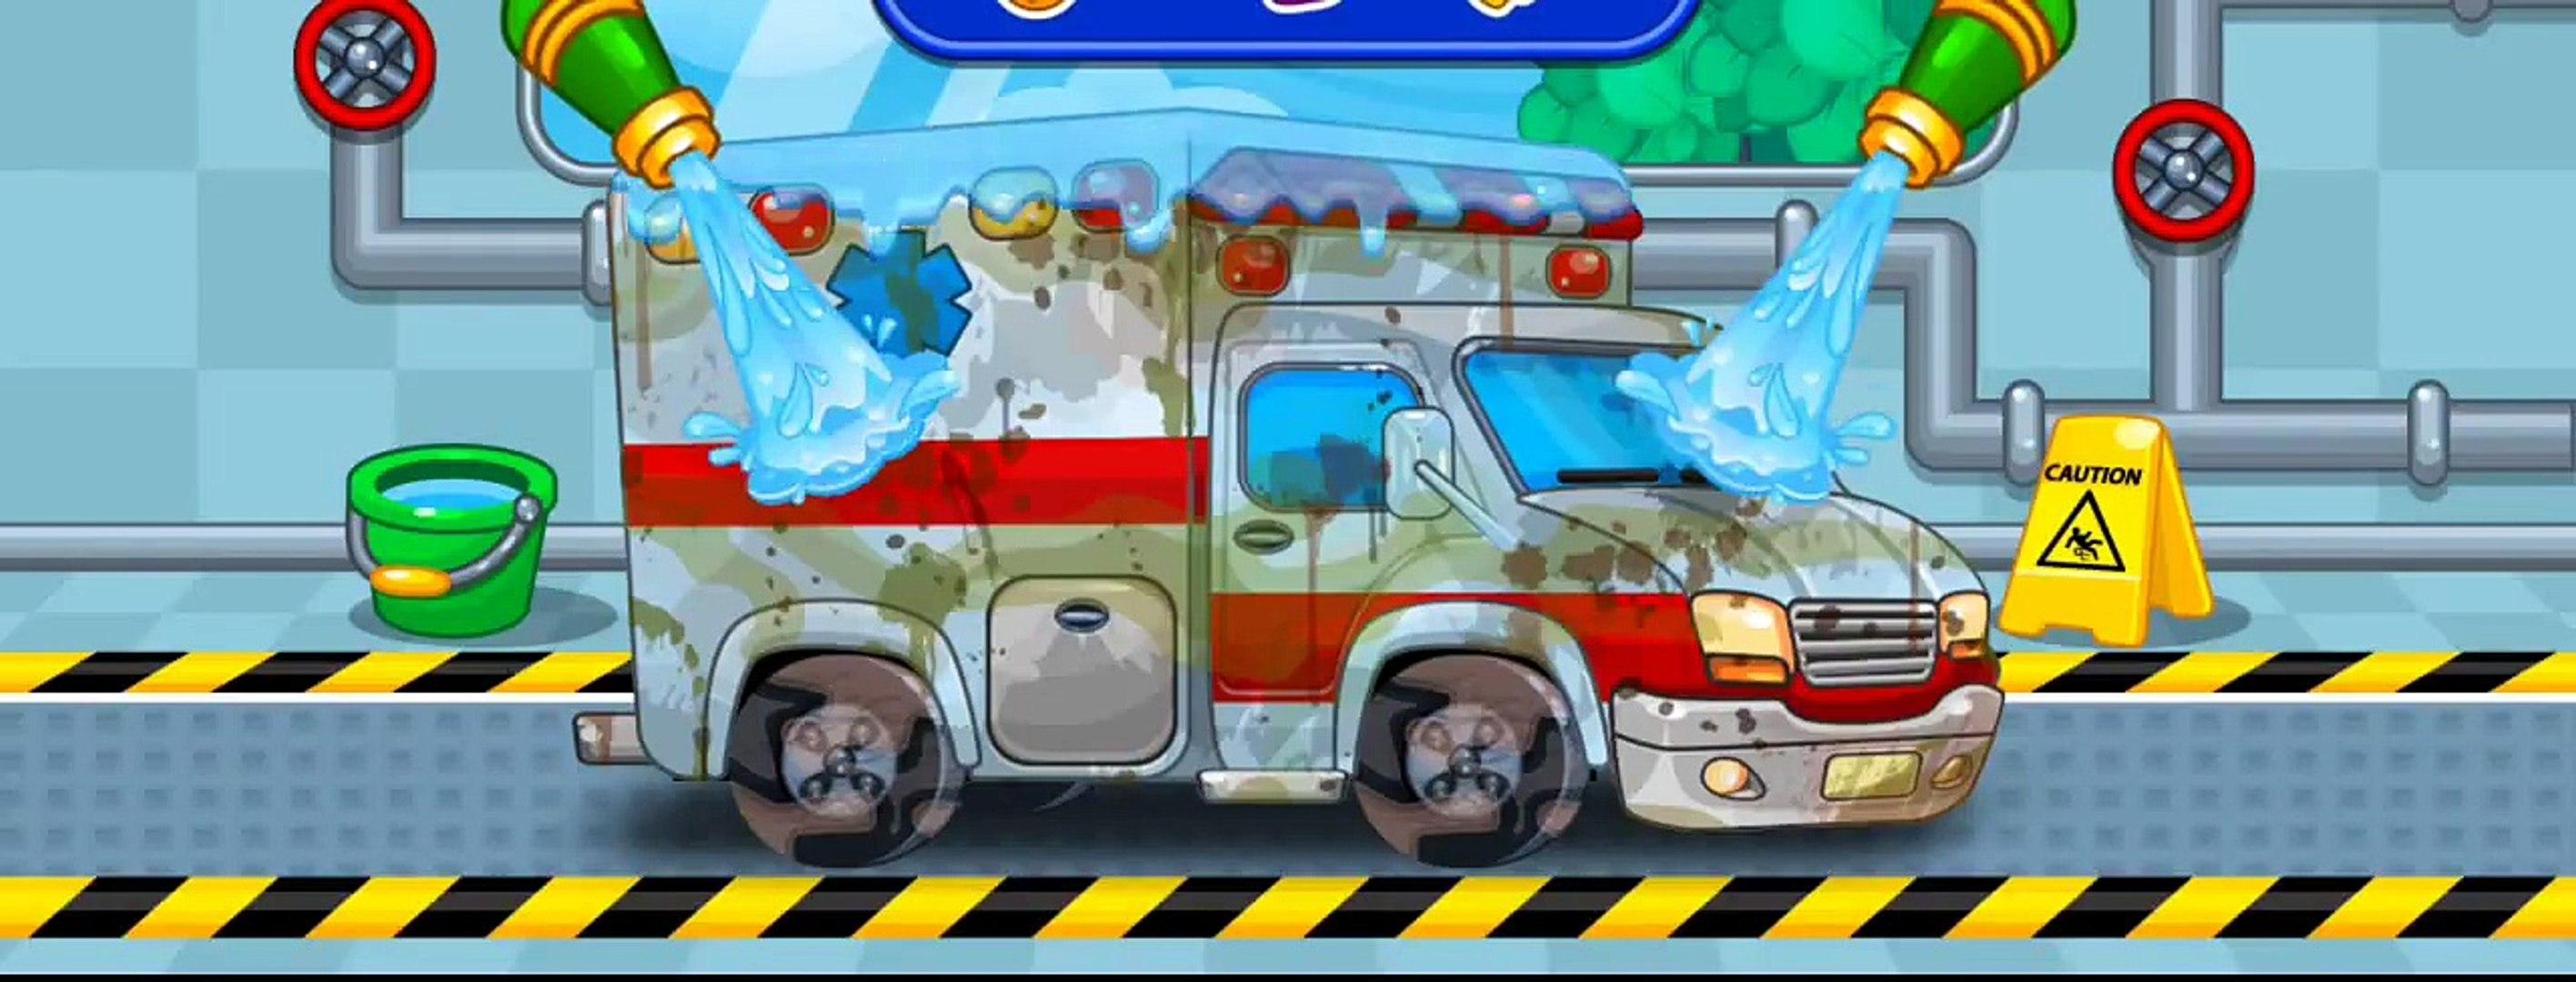 Araba Yikama Boyama Oyunu Eglenceli Cocuk Filmi Ambulans Taksi